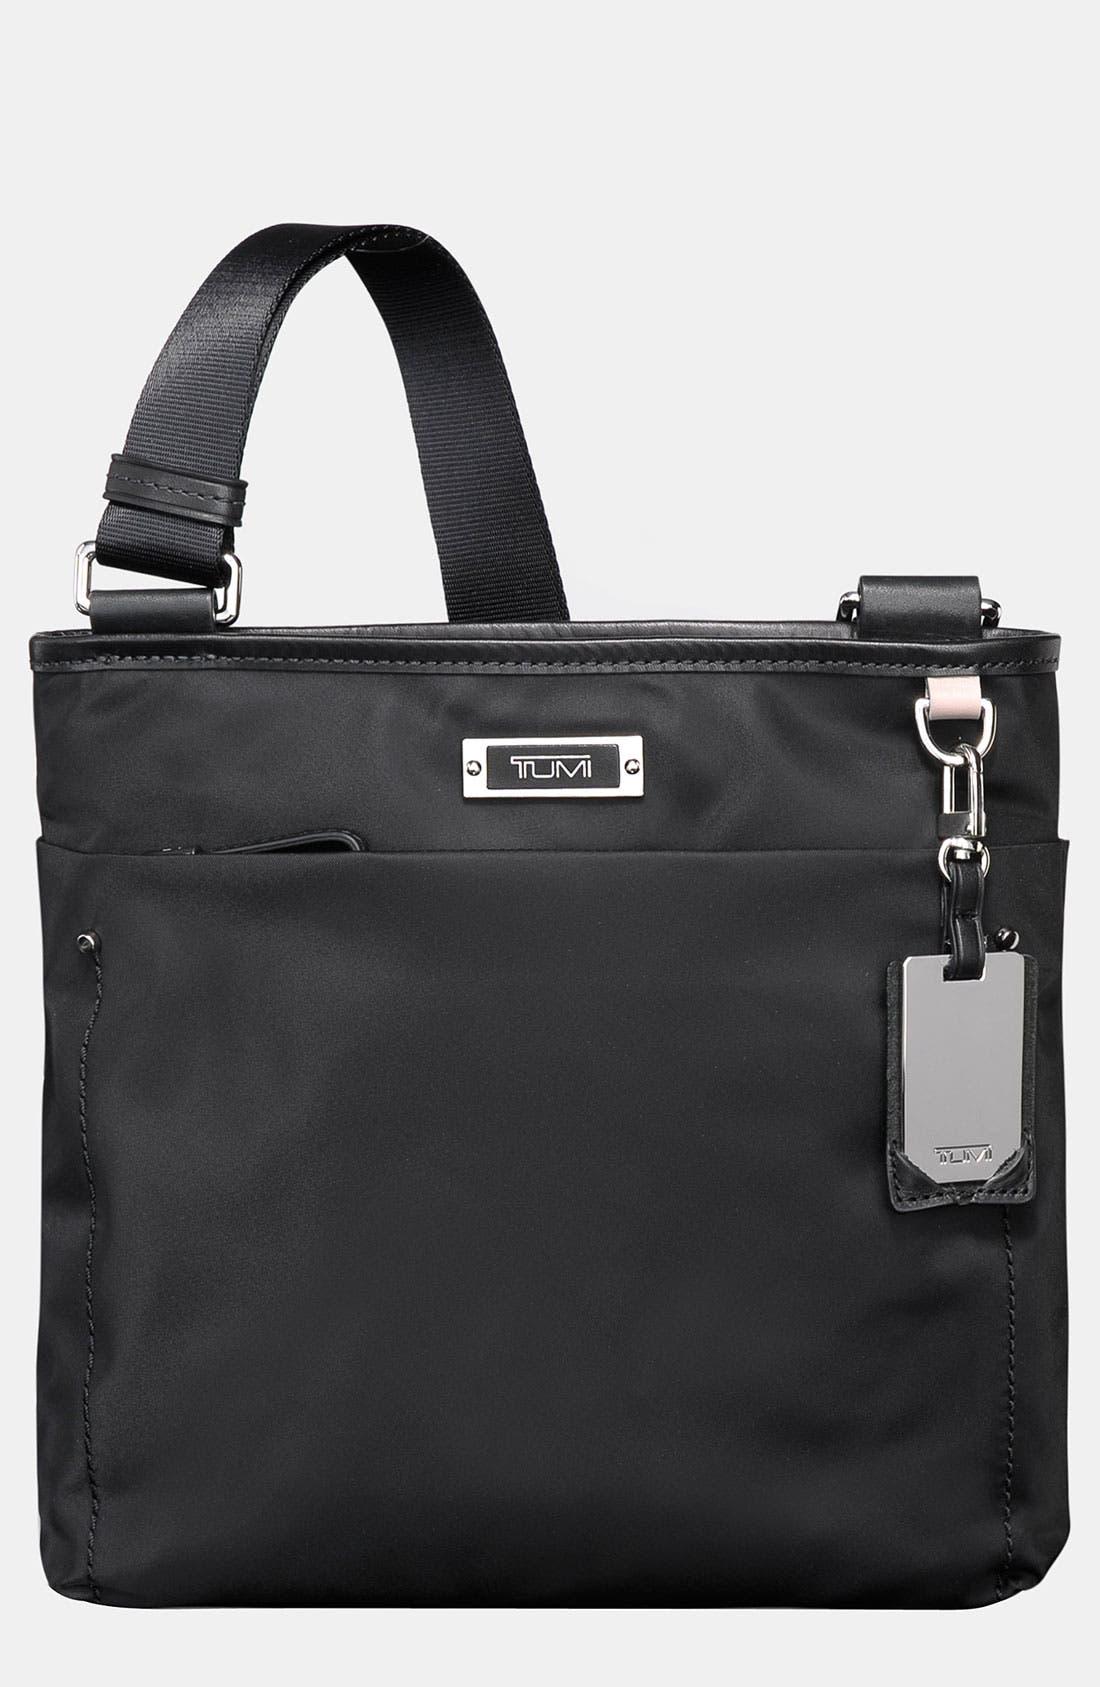 TUMI,                             'Voyageur - Capri' Crossbody Bag,                             Main thumbnail 1, color,                             001